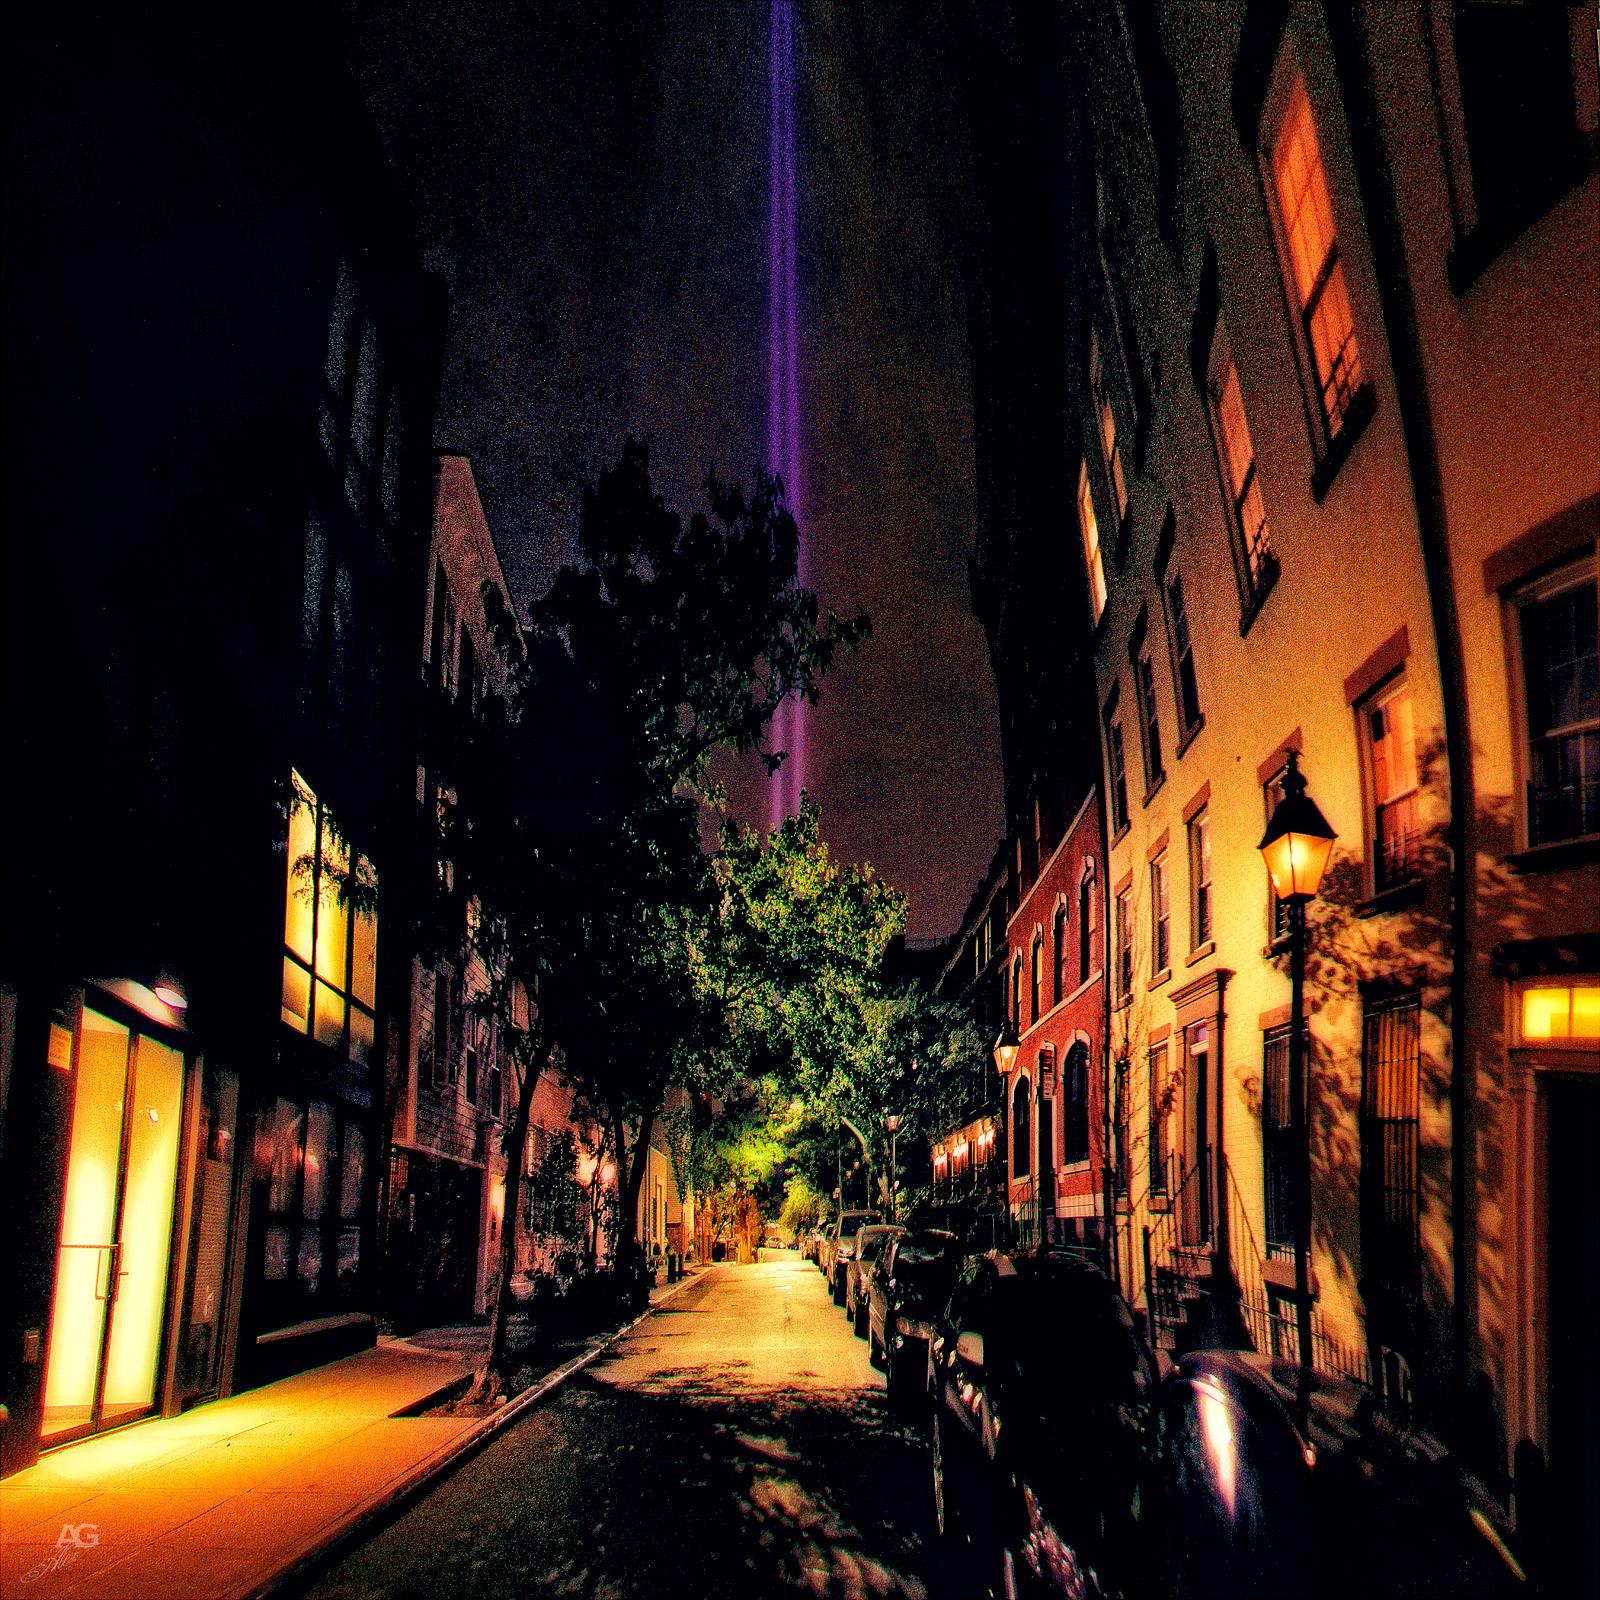 DarkStreetInDowntownBrooklynWith9-11Lights_warped_1600